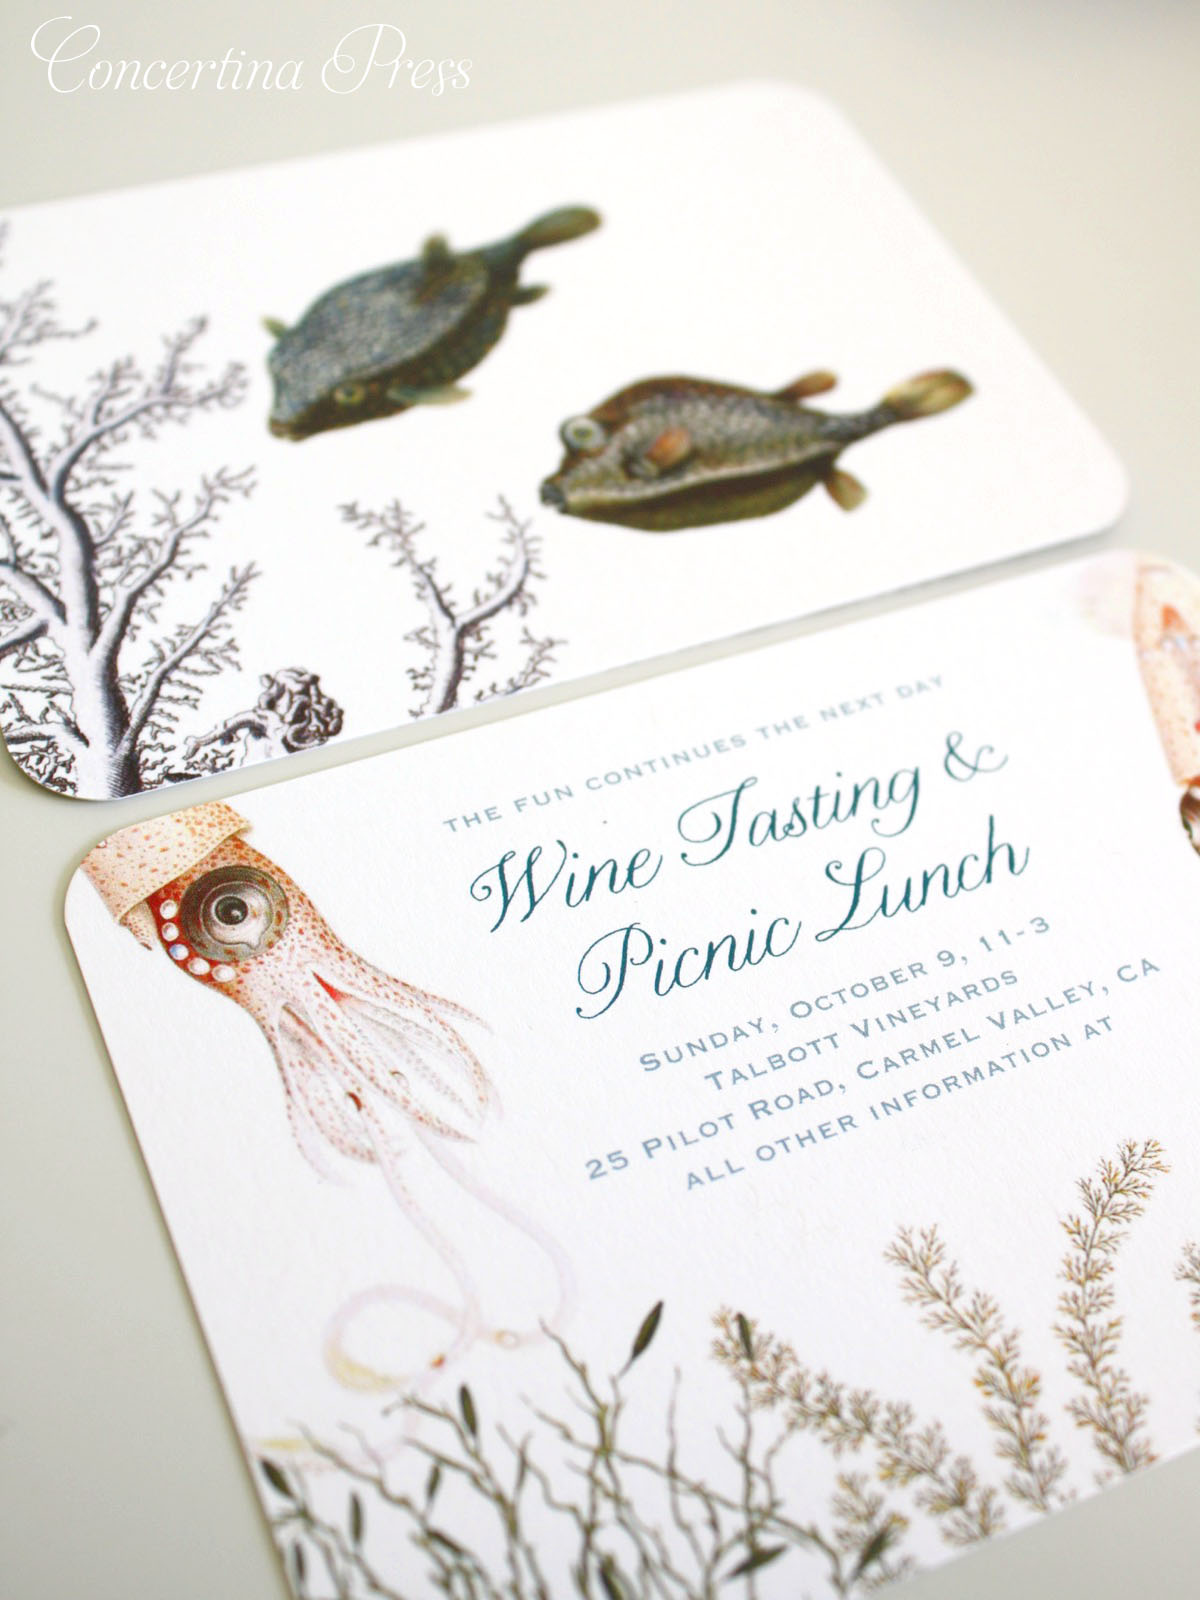 Vow Renewal Invitations - Monterey Bay Aquarium